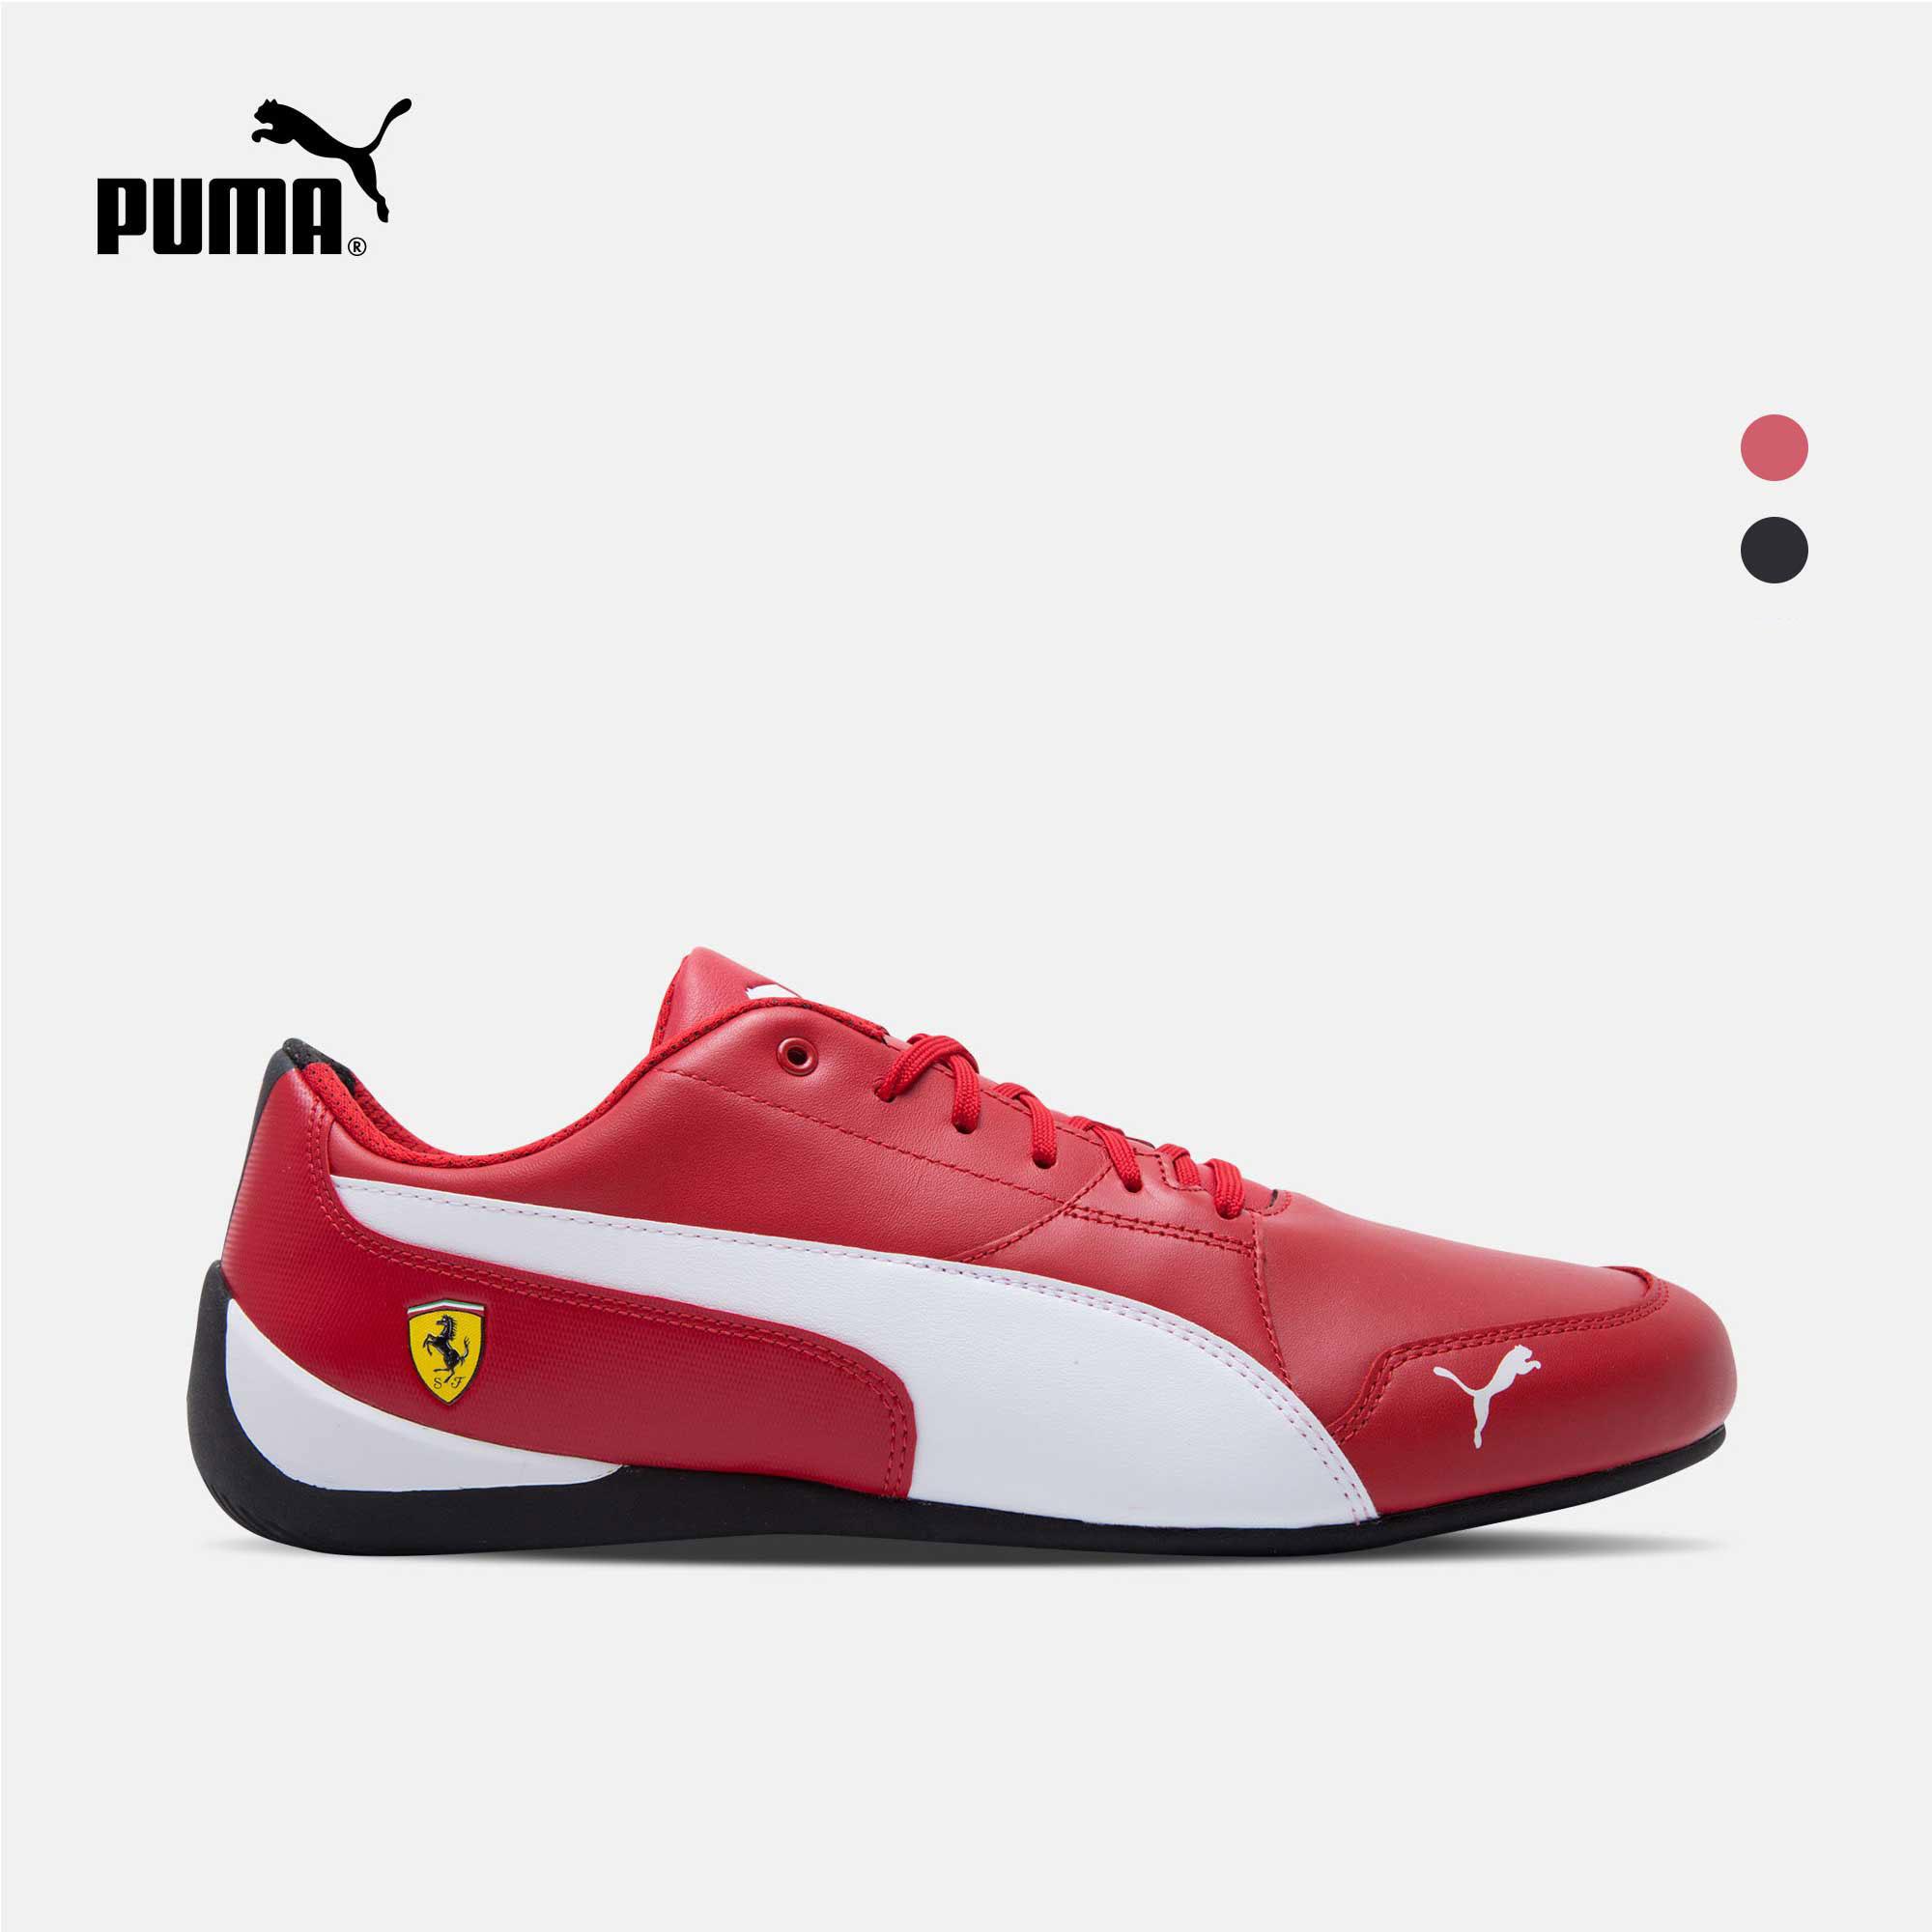 ... best price puma puma official mens racing shoes scuderia ferrari drift  cat 7 305998 c1e99 2e214 ... 6a71f434d